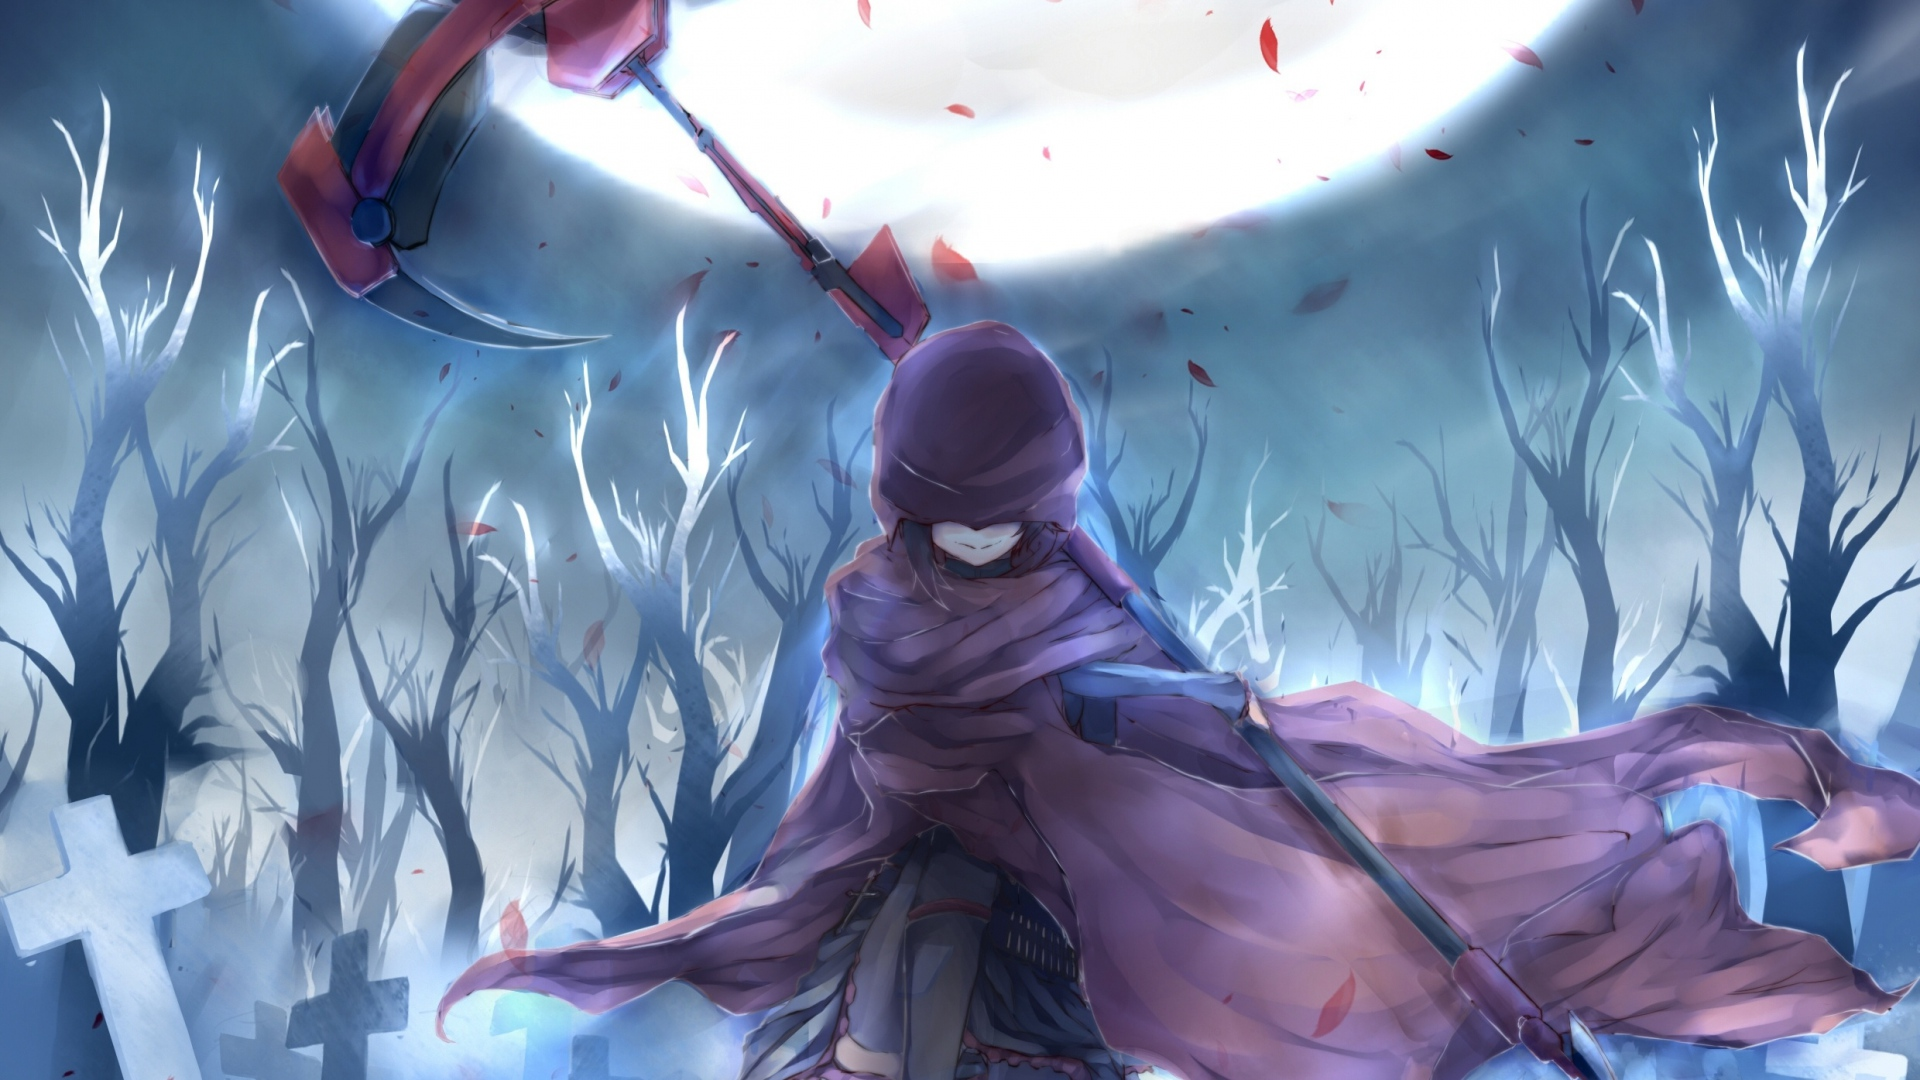 1920x1080-ruby-rwby-anime-drawing-cape-wallpaper-wpc5801029